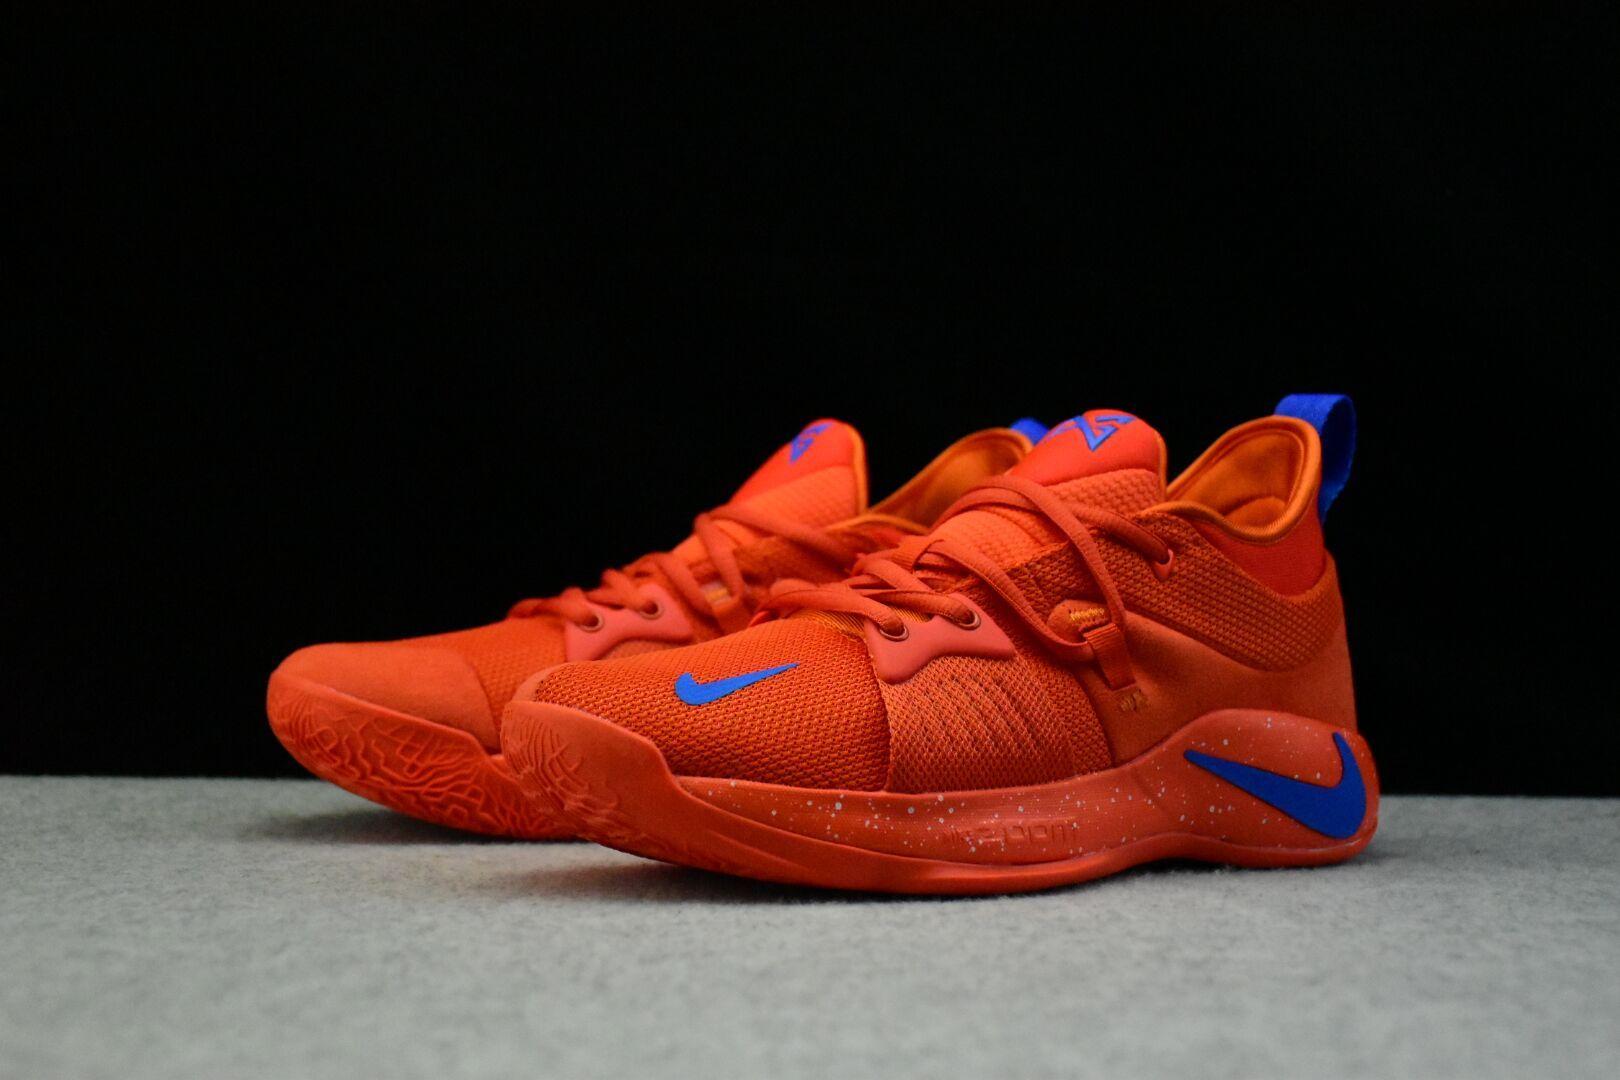 quality design 5eec5 ce647 Nike PG 2 Team Orange/Signal Blue Men's Basketball Shoes ...